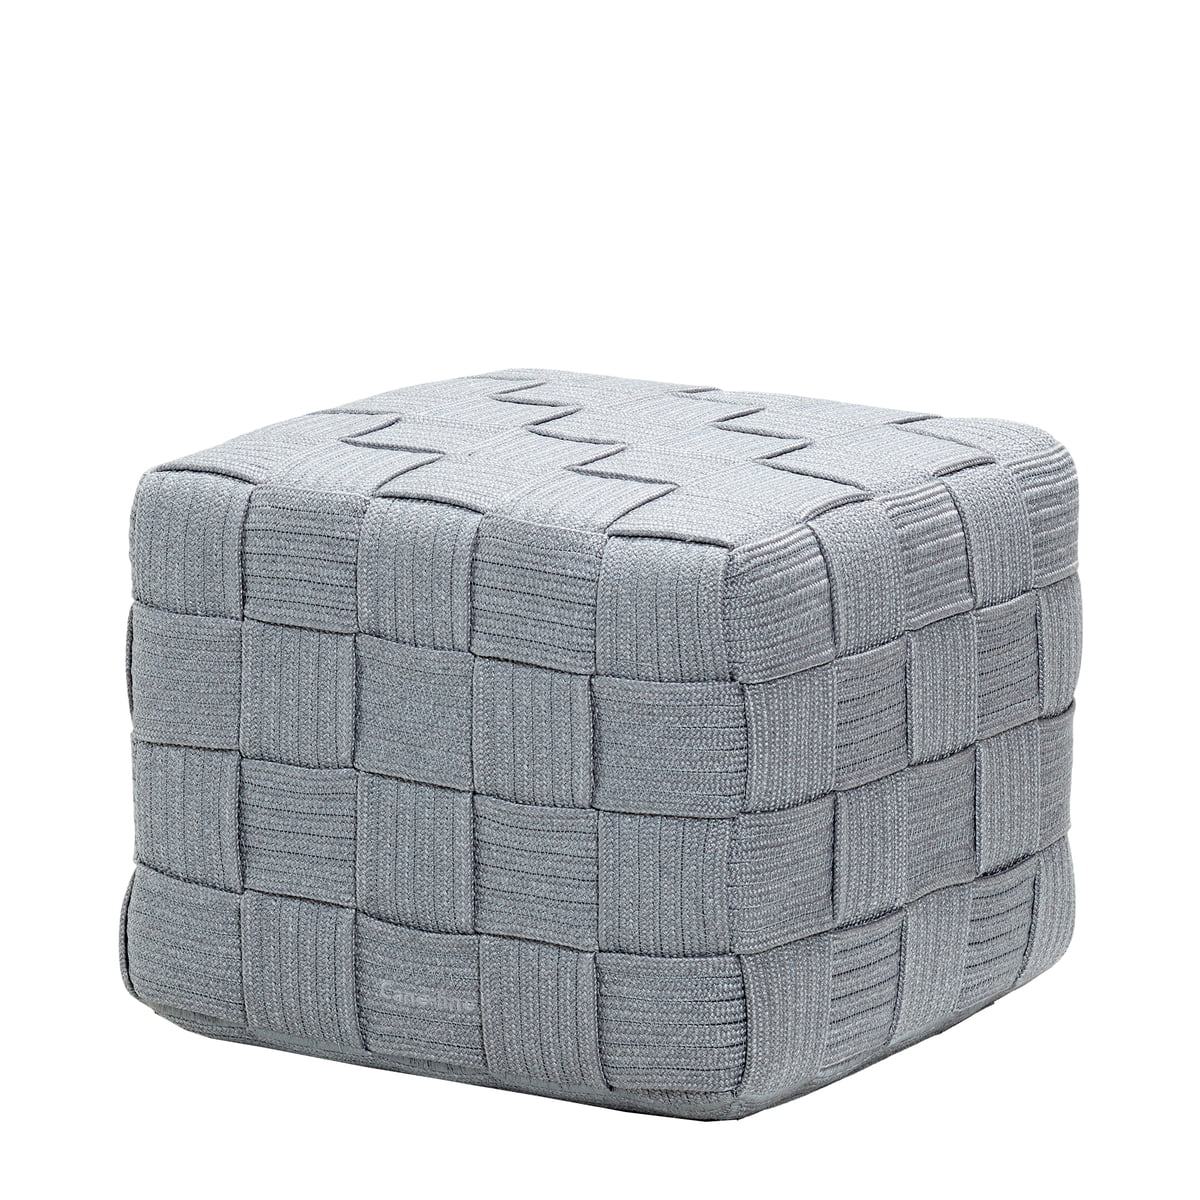 Cane-line - Cube Hocker (8340), hellgrau